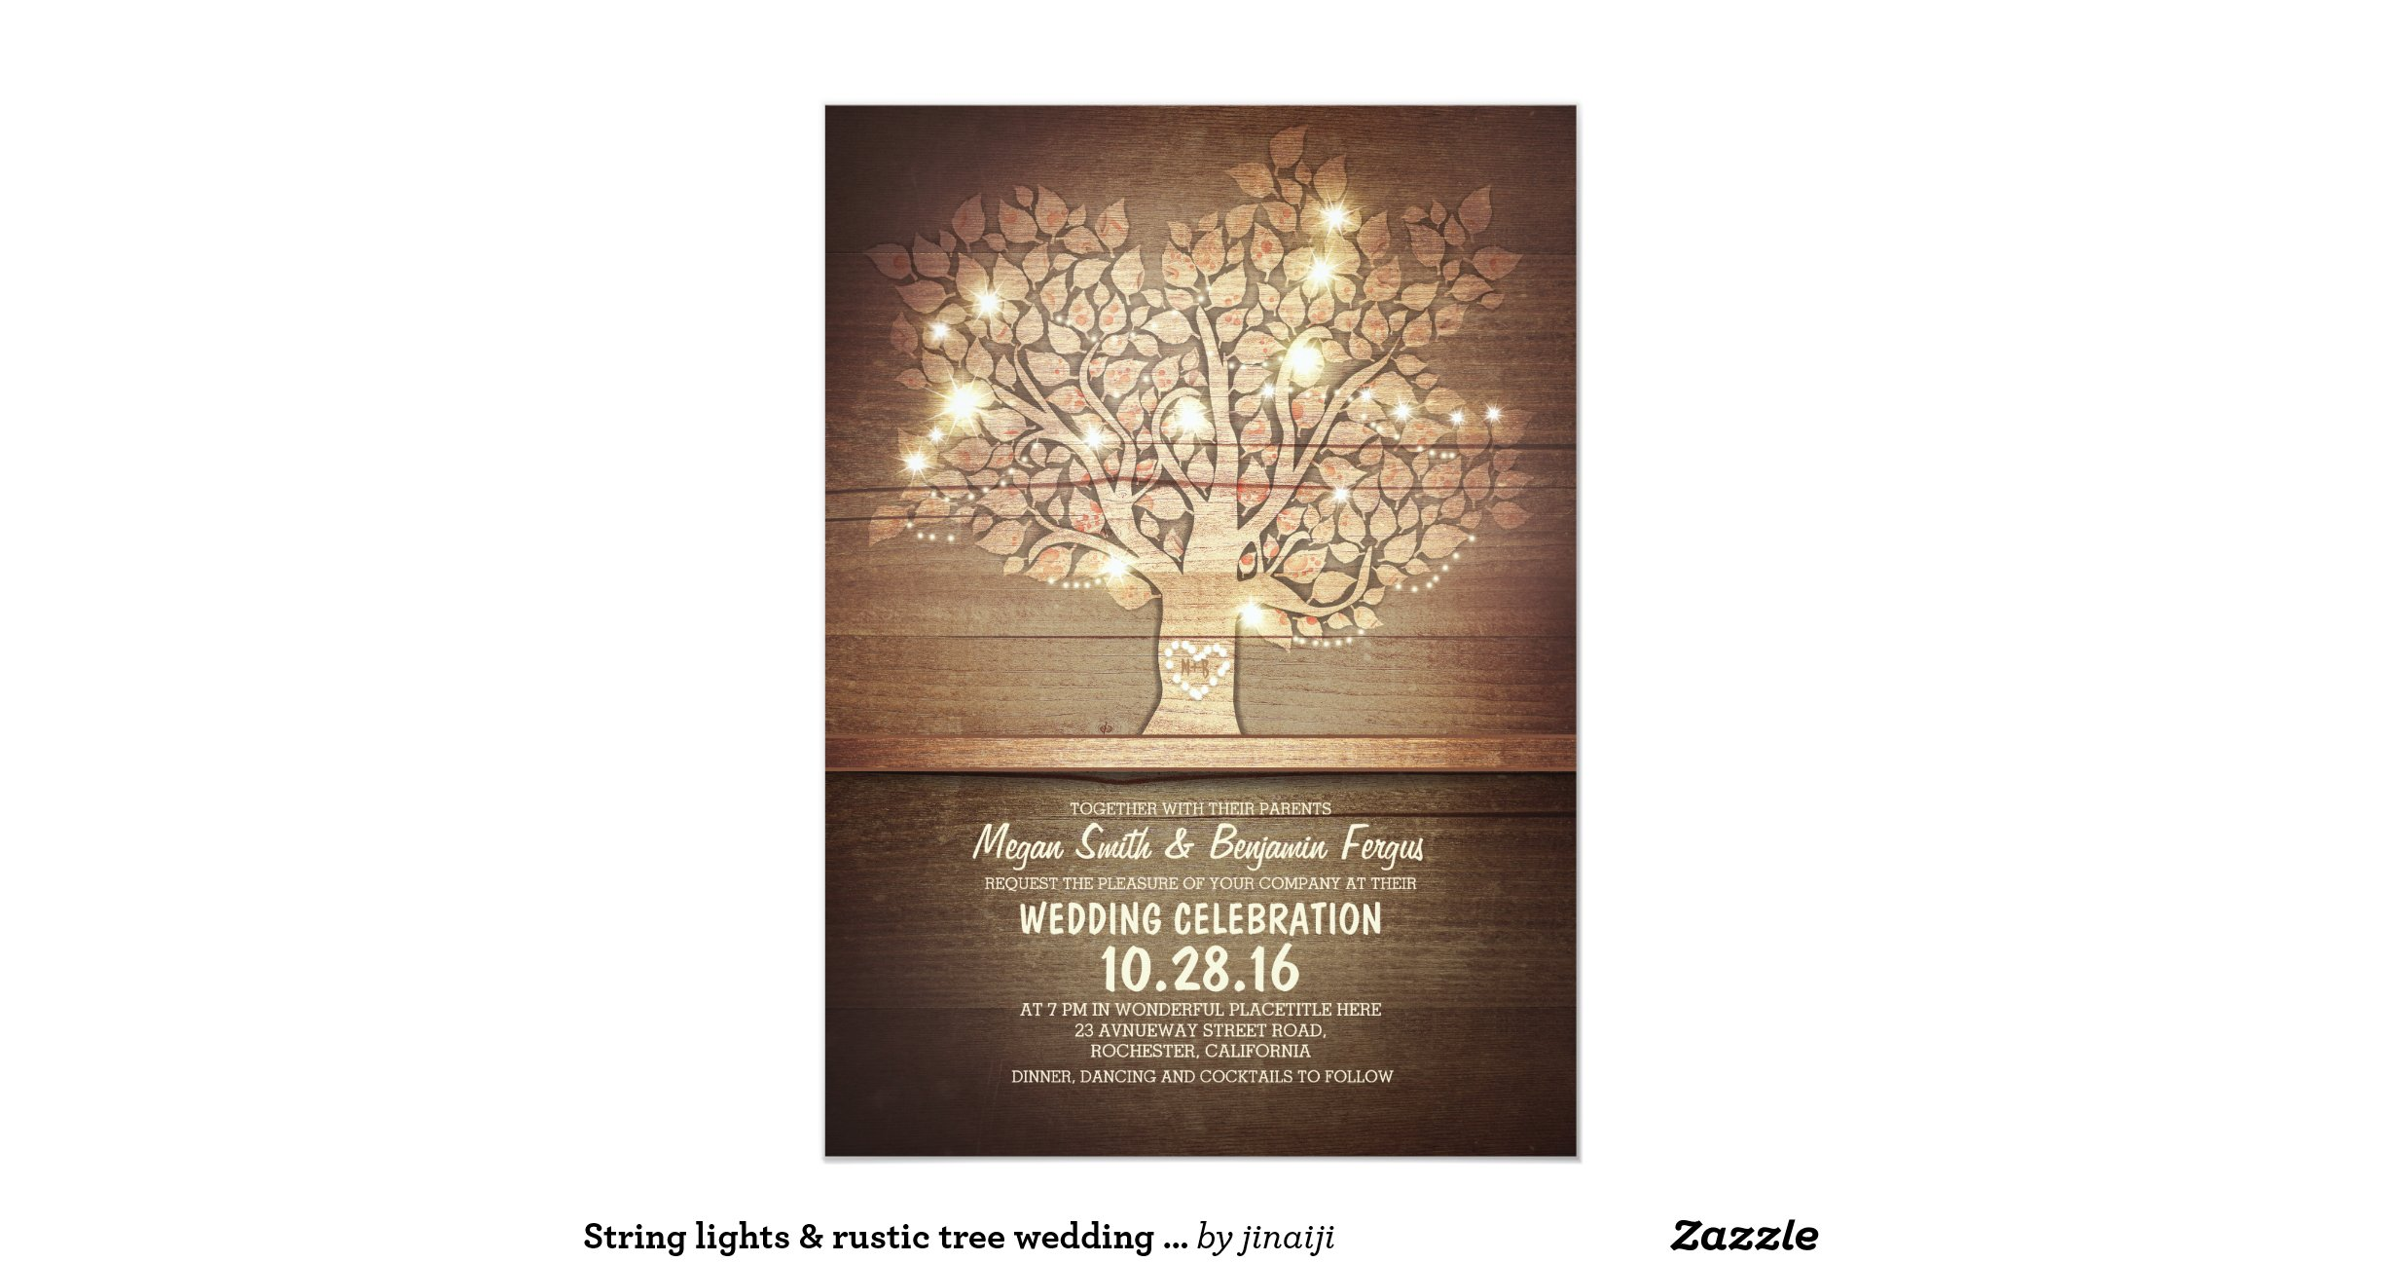 string_lights_rustic_tree_wedding_invitations-r38ded8b2e95148f5bef0bdb940c6d8af_zkrqs_1200.jpg ...